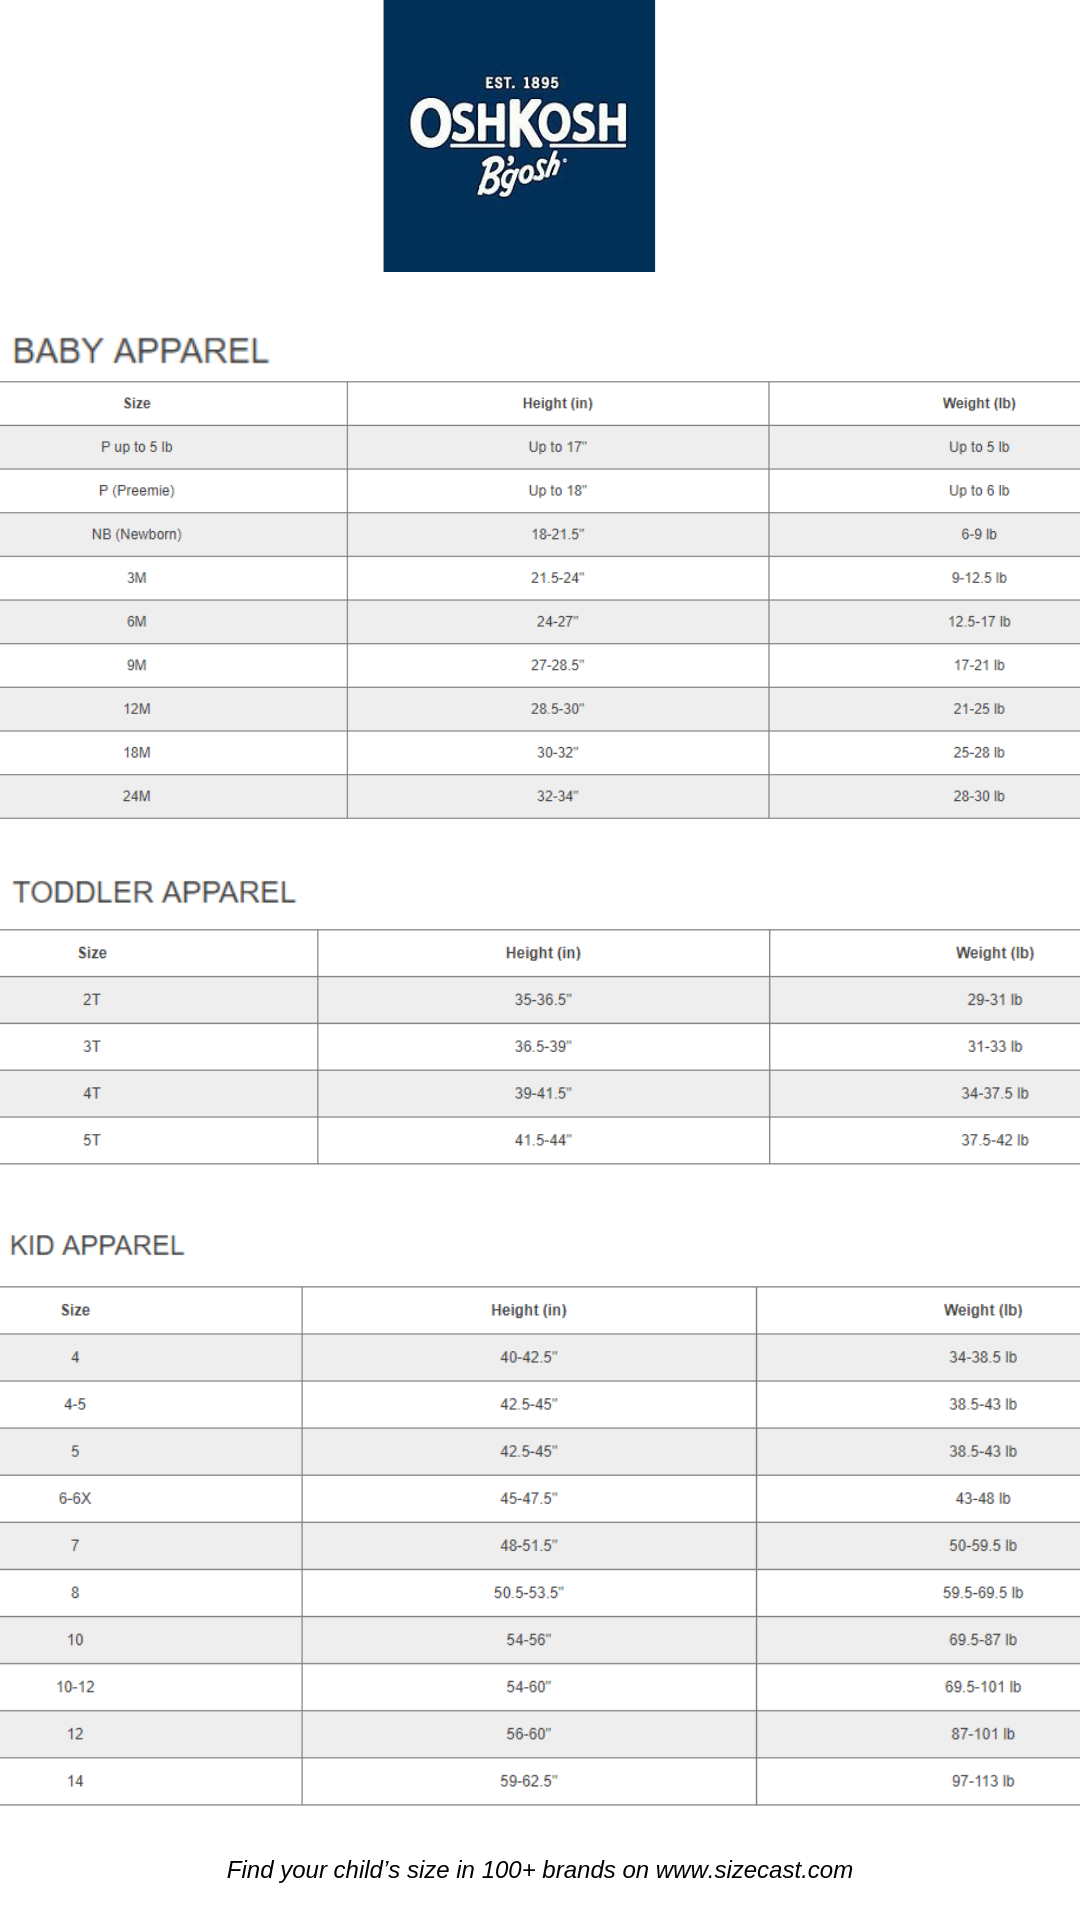 OshKosh B'gosh size chart, baby clothes